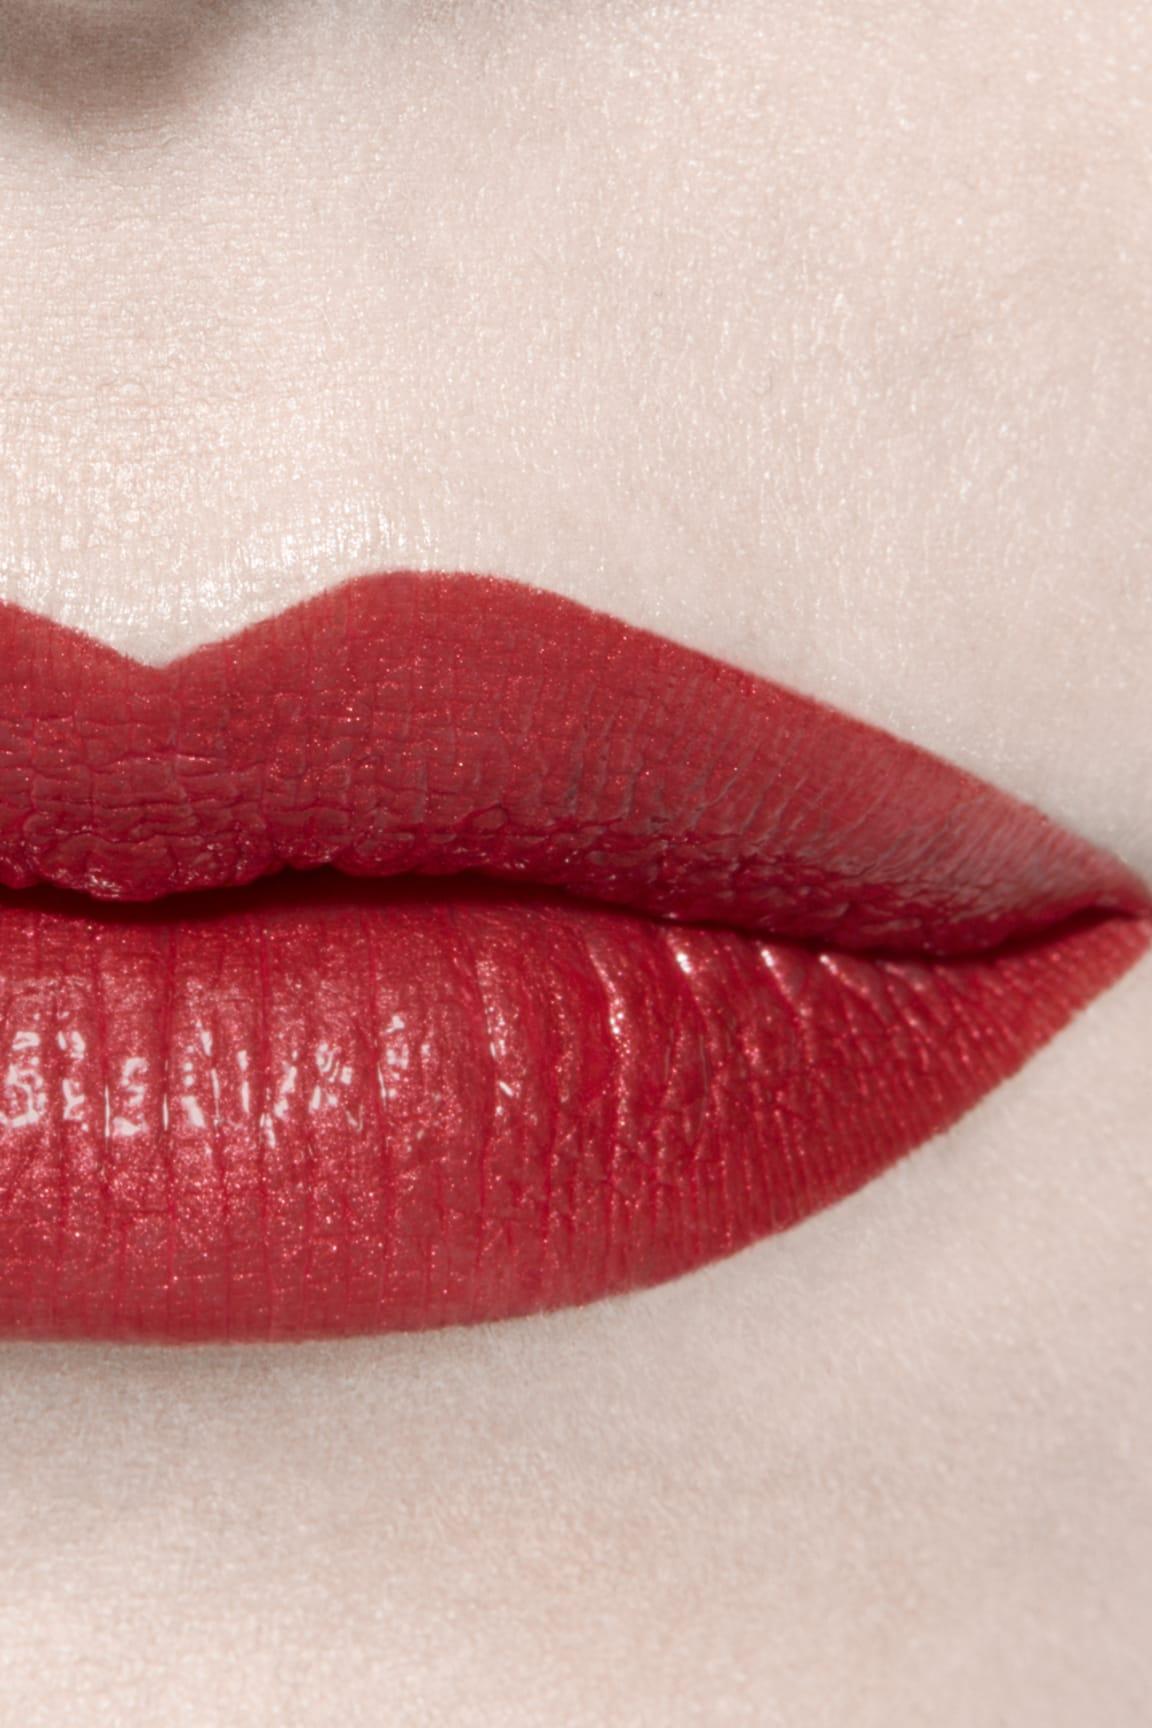 Visuel d'application maquillage 3 - ROUGE ALLURE LAQUE 71 - MYTHE